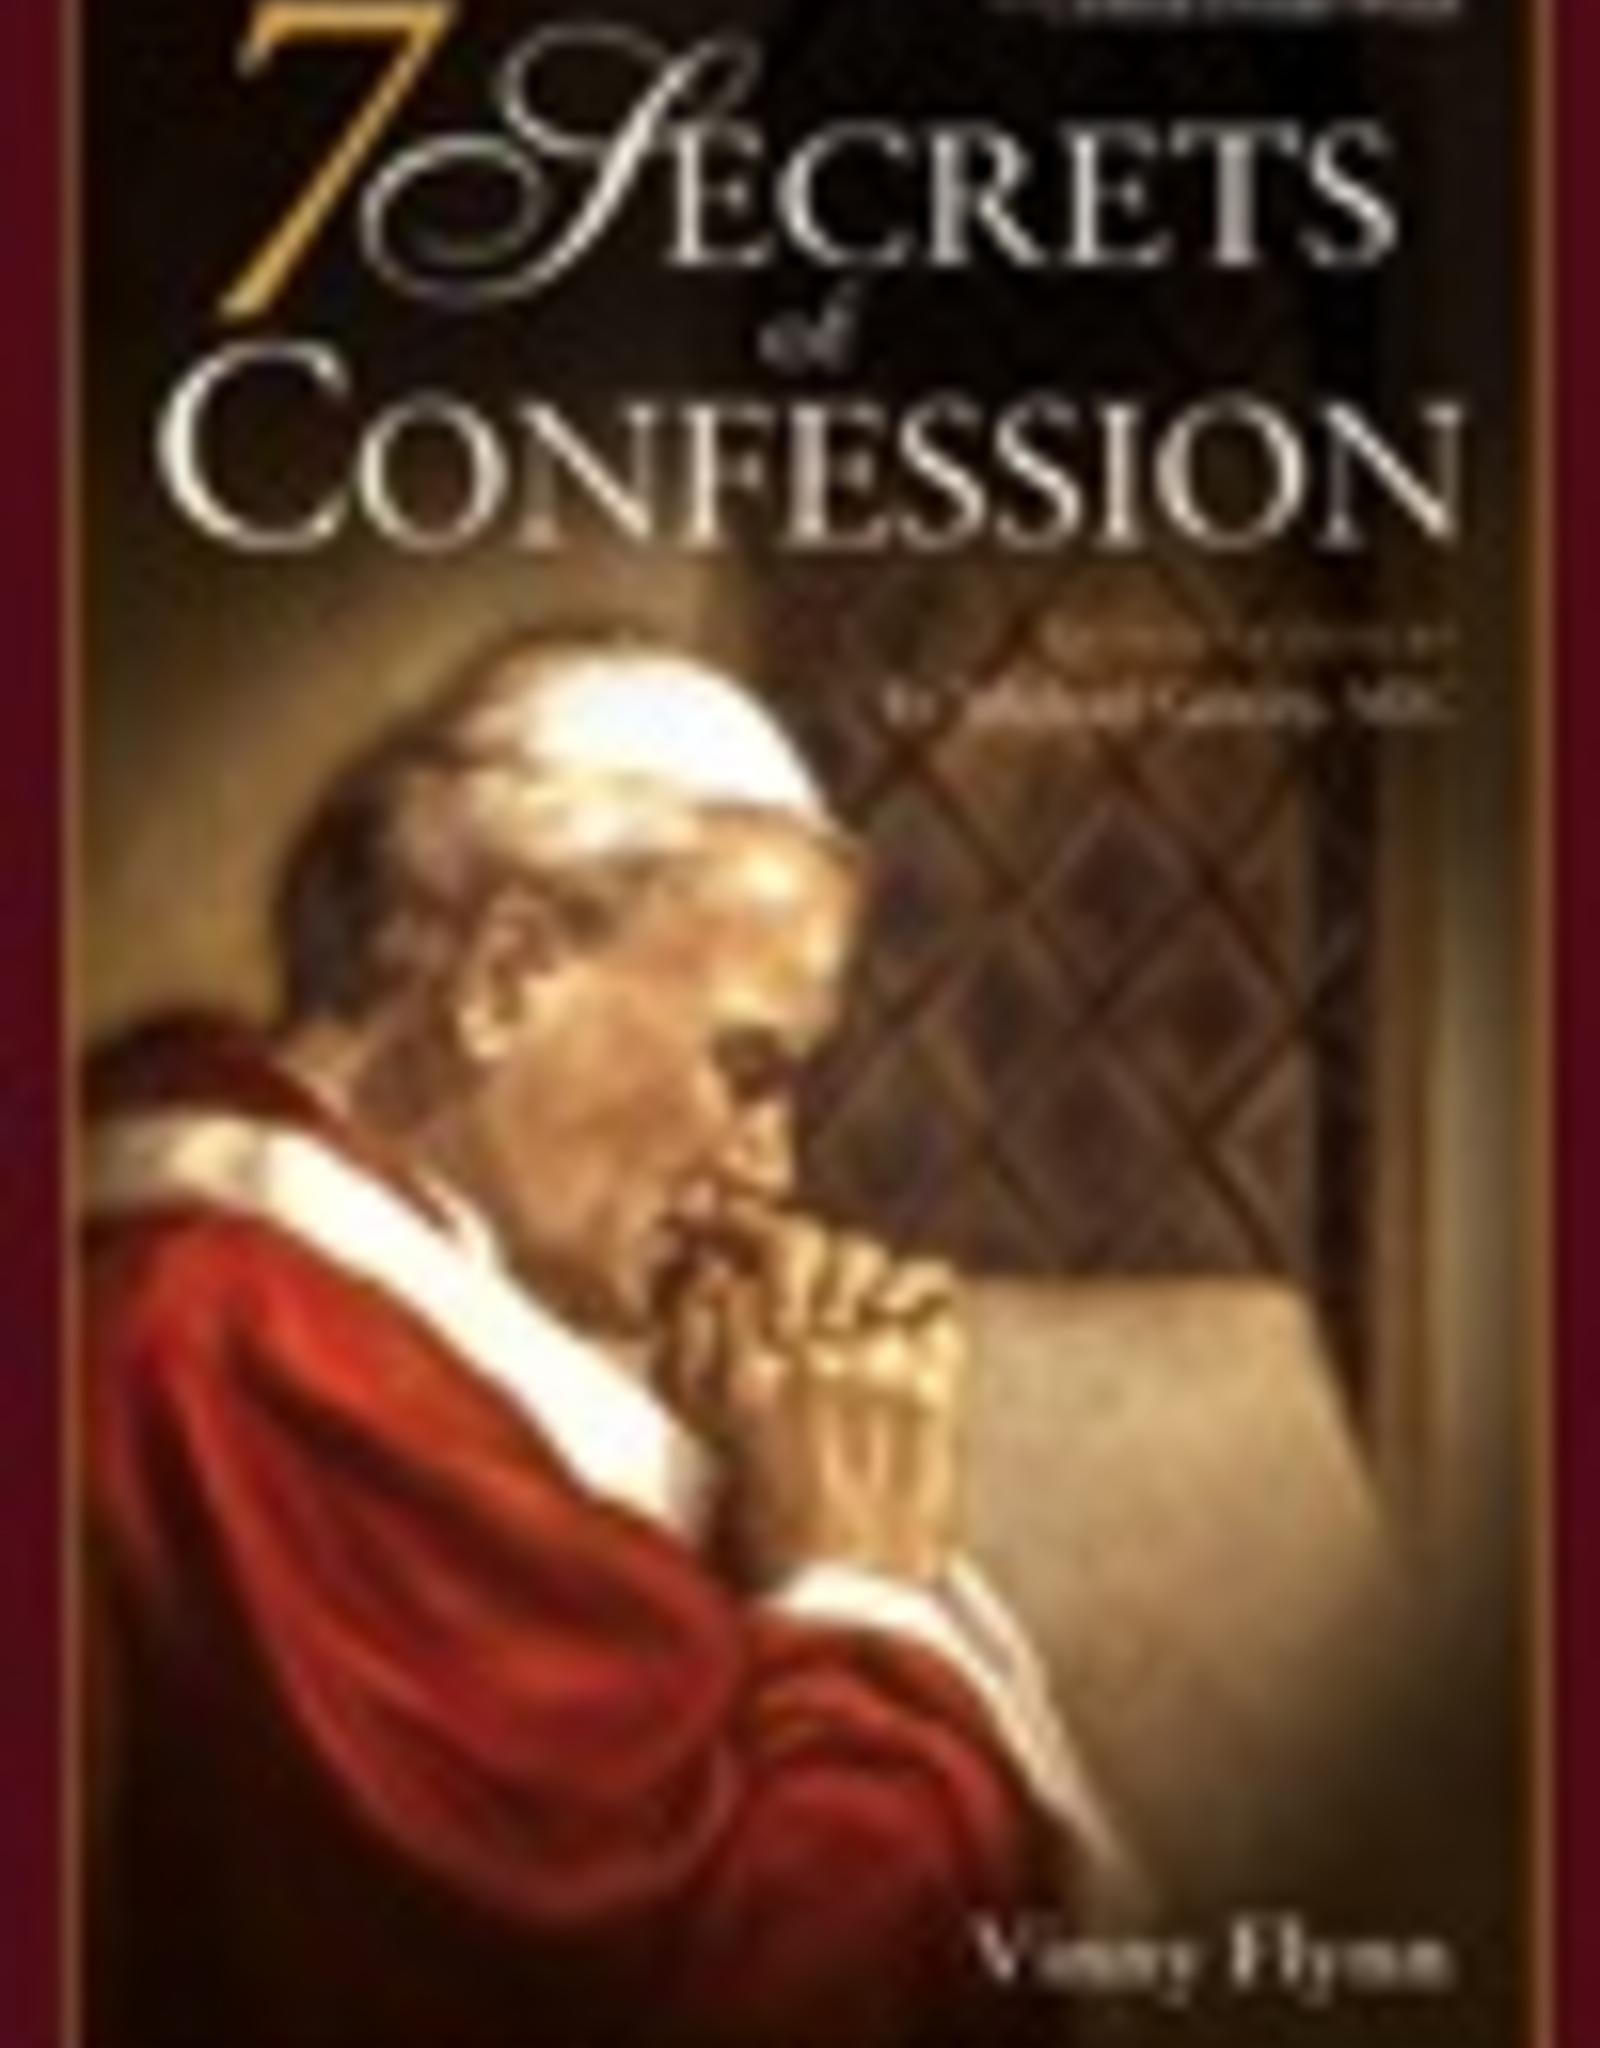 Ignatius Press 7 Secrets of Confession, by Vinny Flynn (paperback)